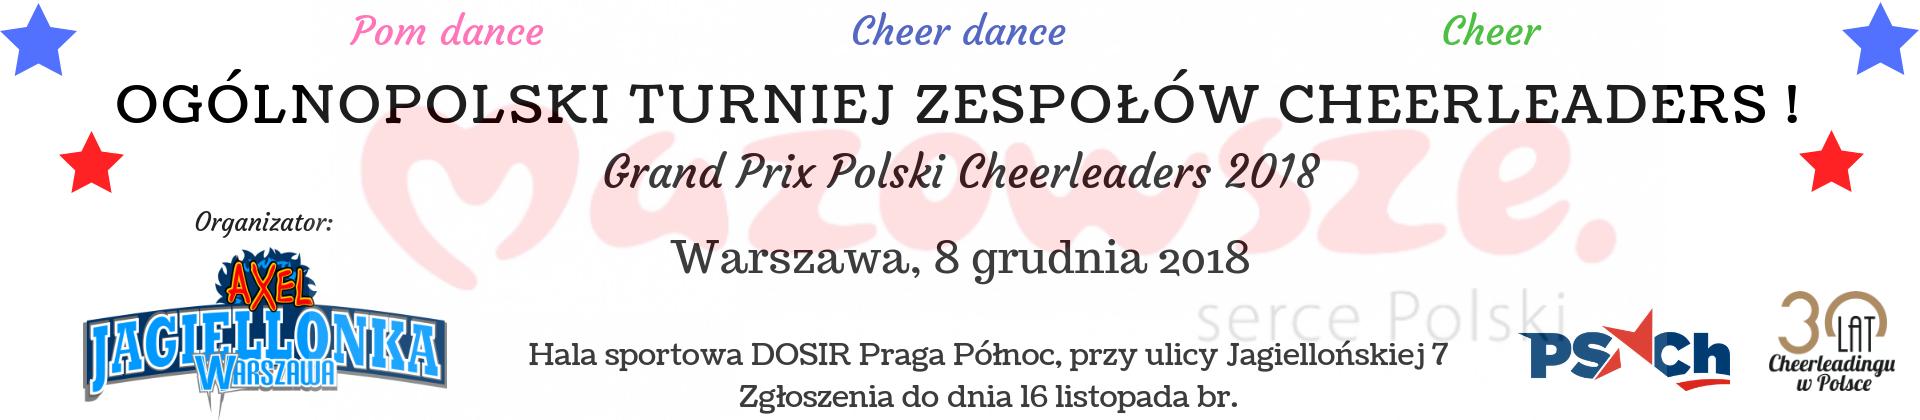 Grand Prix Polski Cheerleaders 2018 (6)